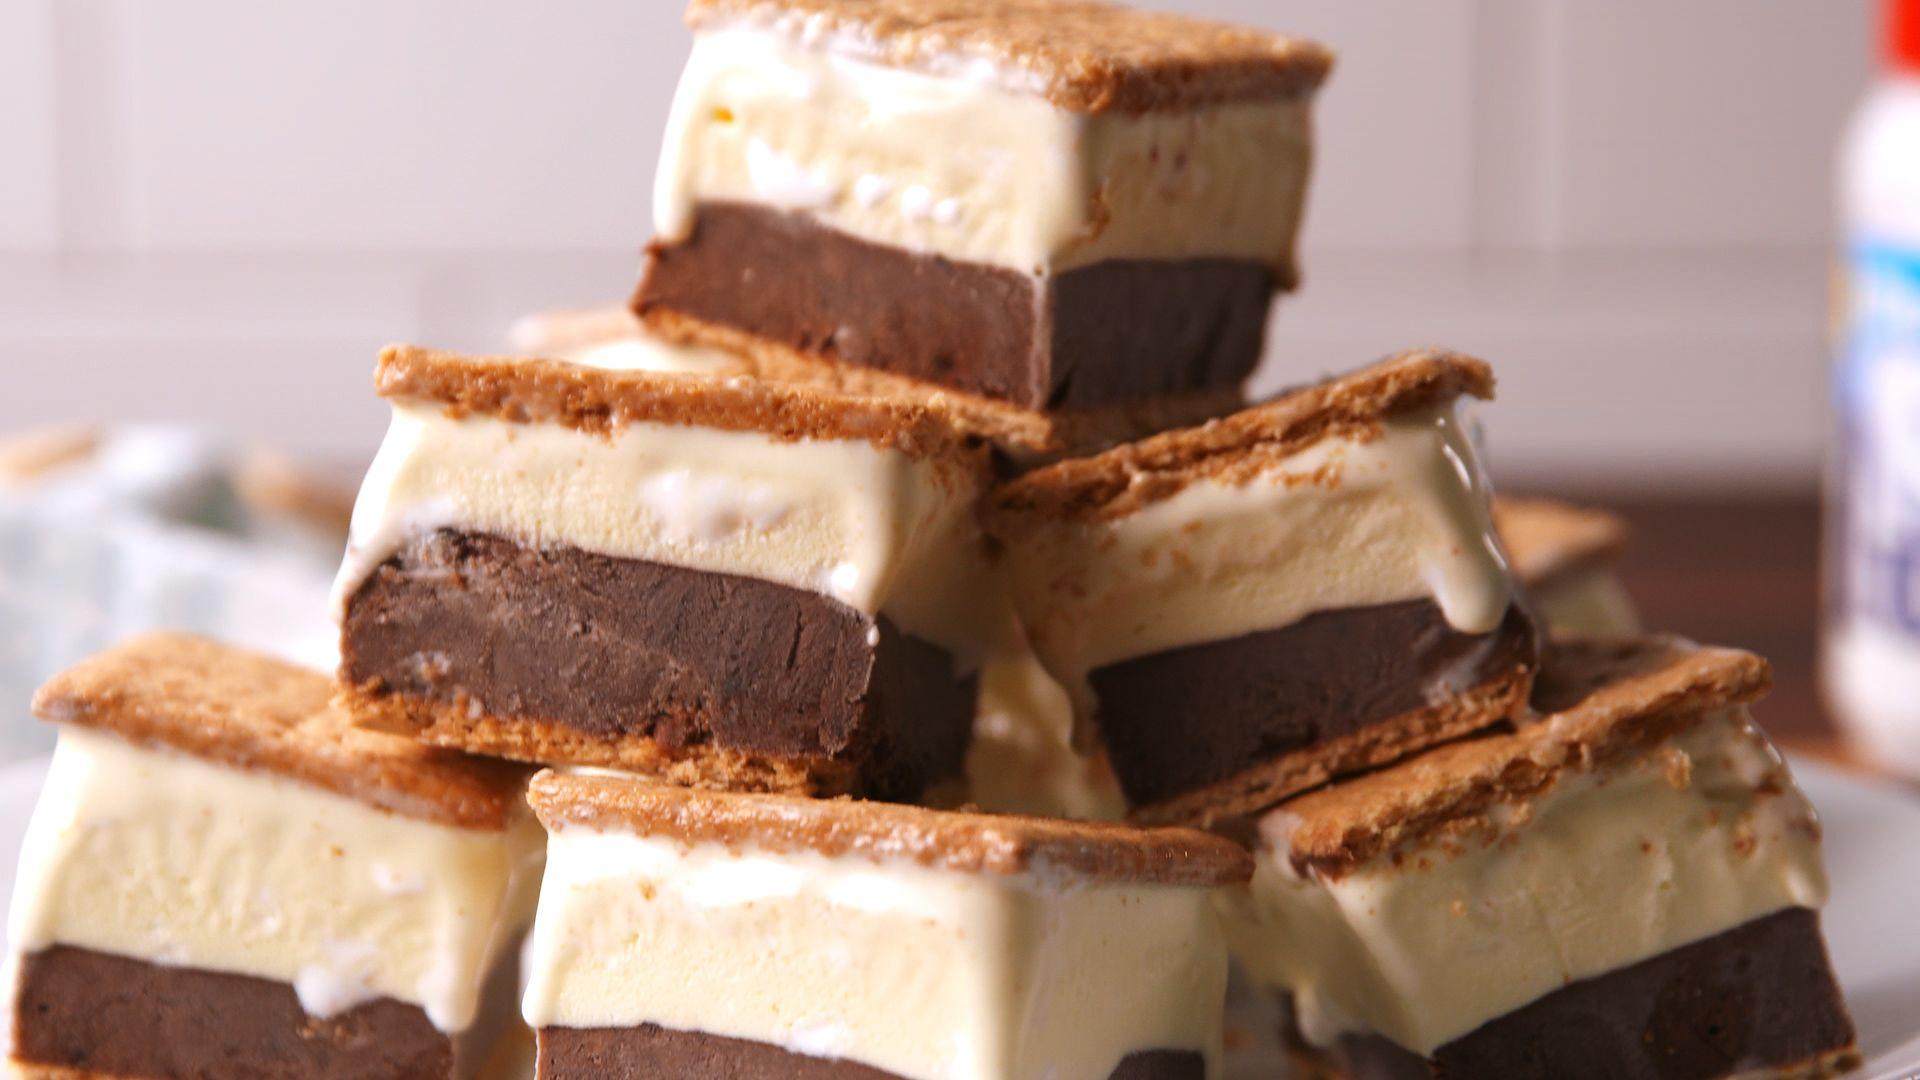 Forum on this topic: Frozen Smore Snacks, frozen-smore-snacks/